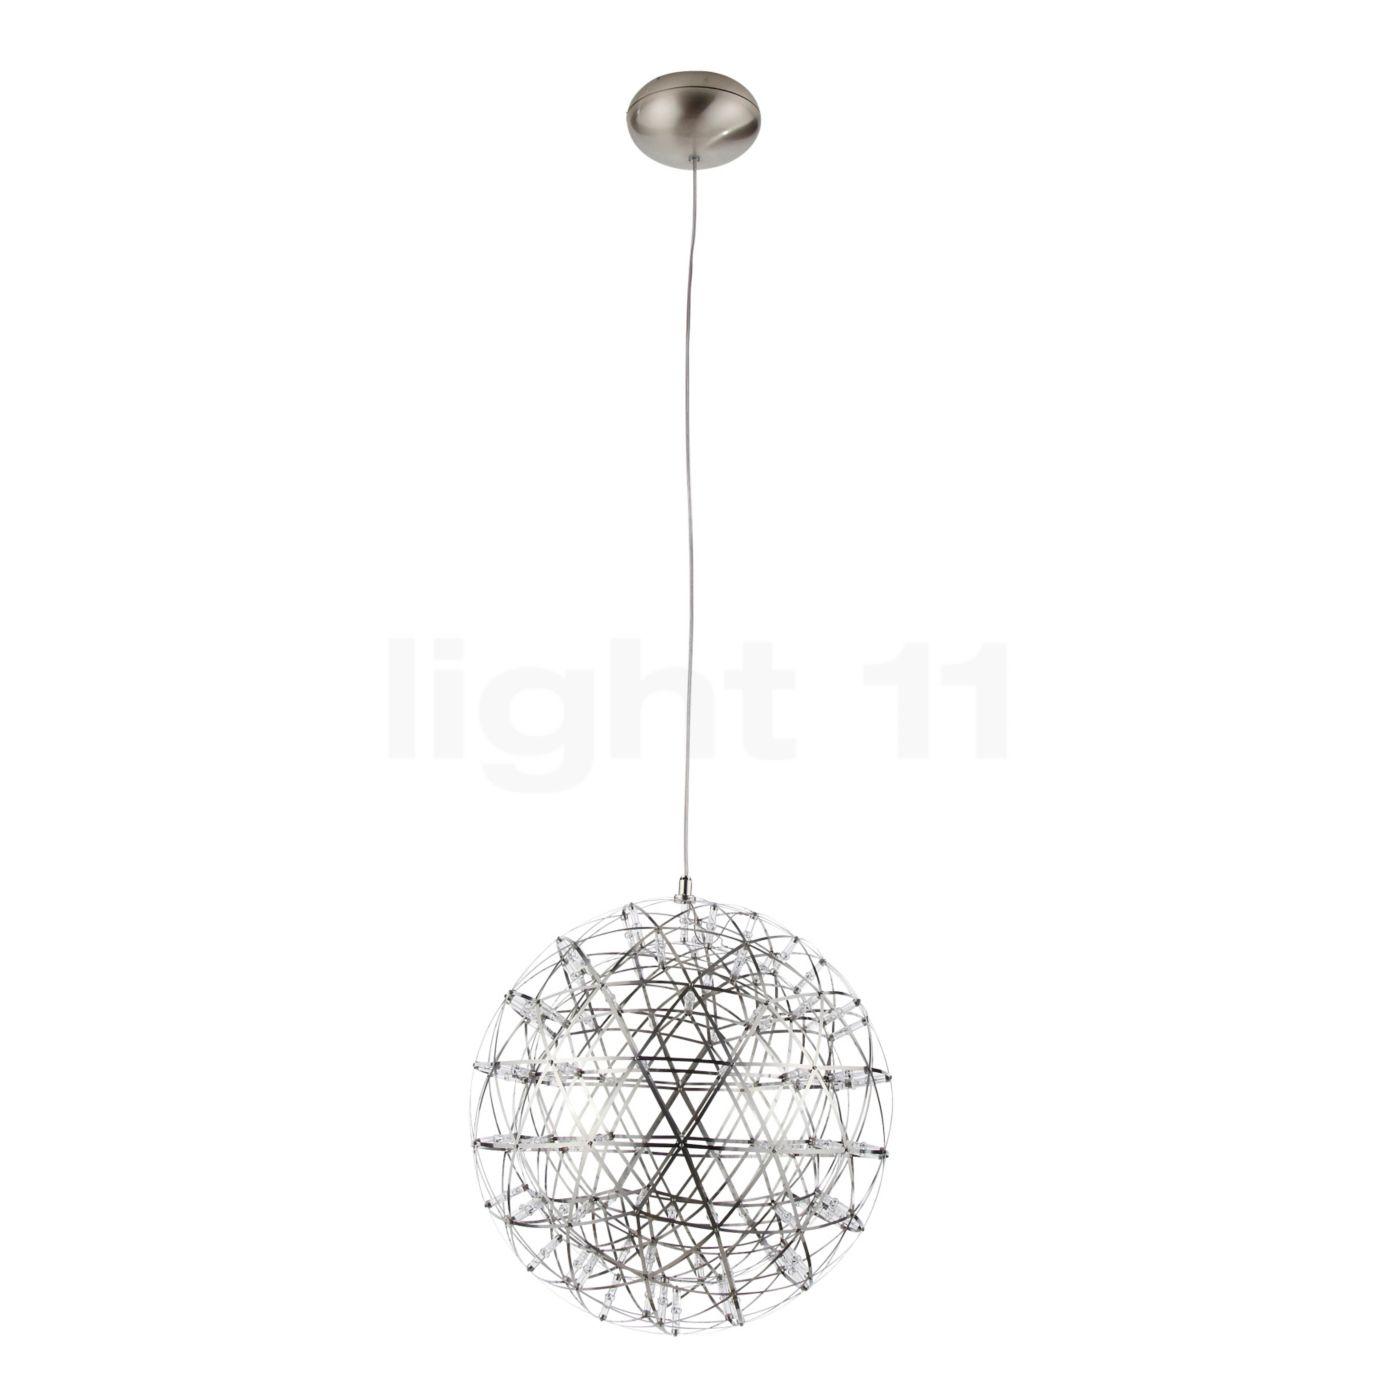 Moooi Raimond pendant light Chandeliers buy at light11.eu for Moooi Raimond Dome  15lptgx